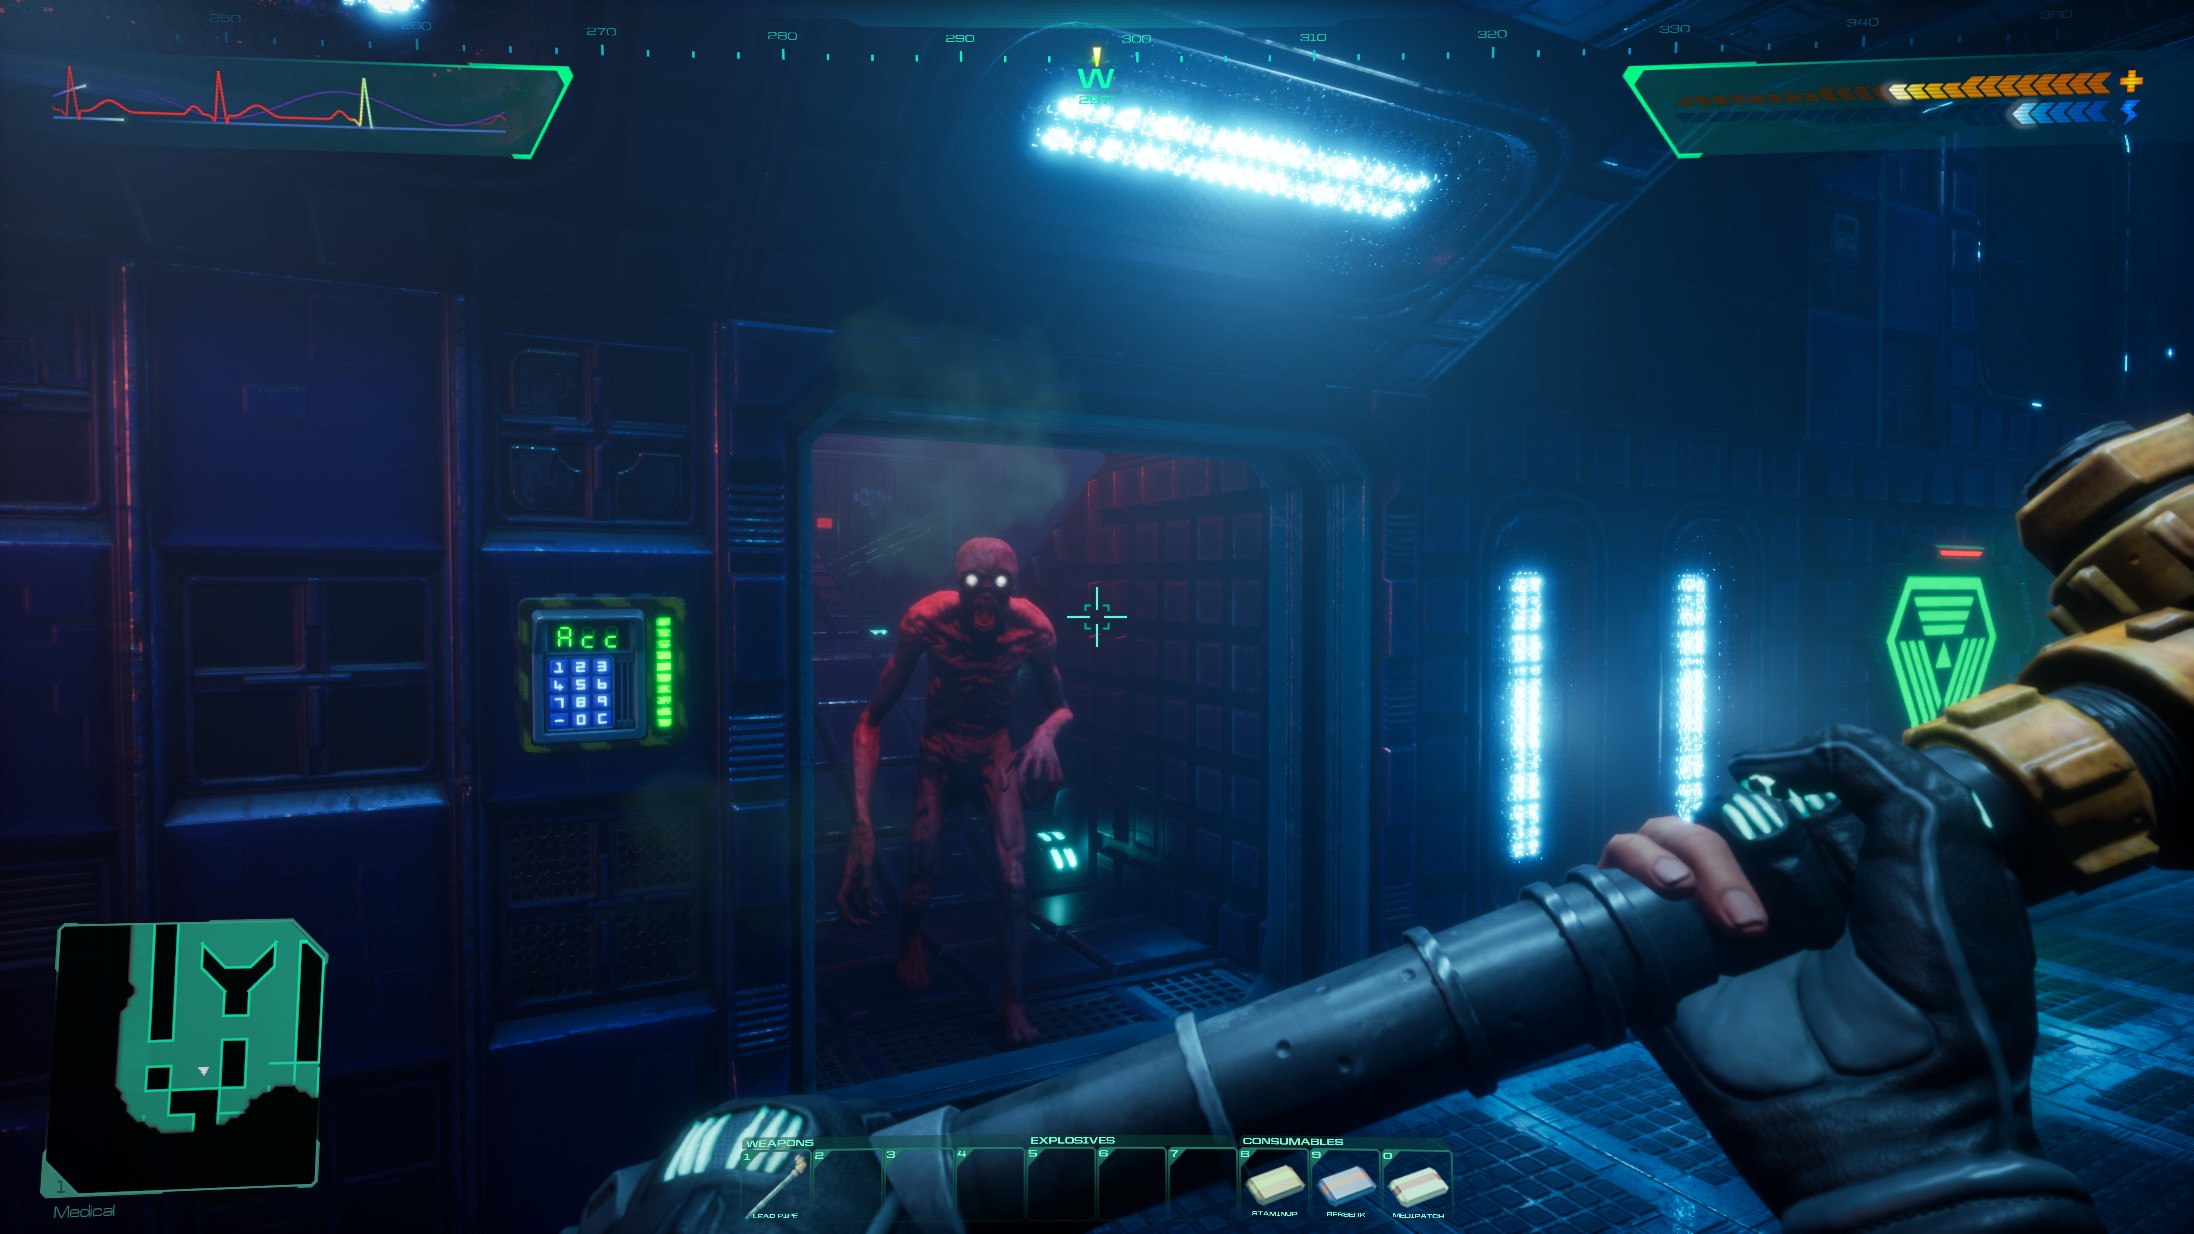 System Shock remake pre-orders arrive alongside a 'final demo' next month